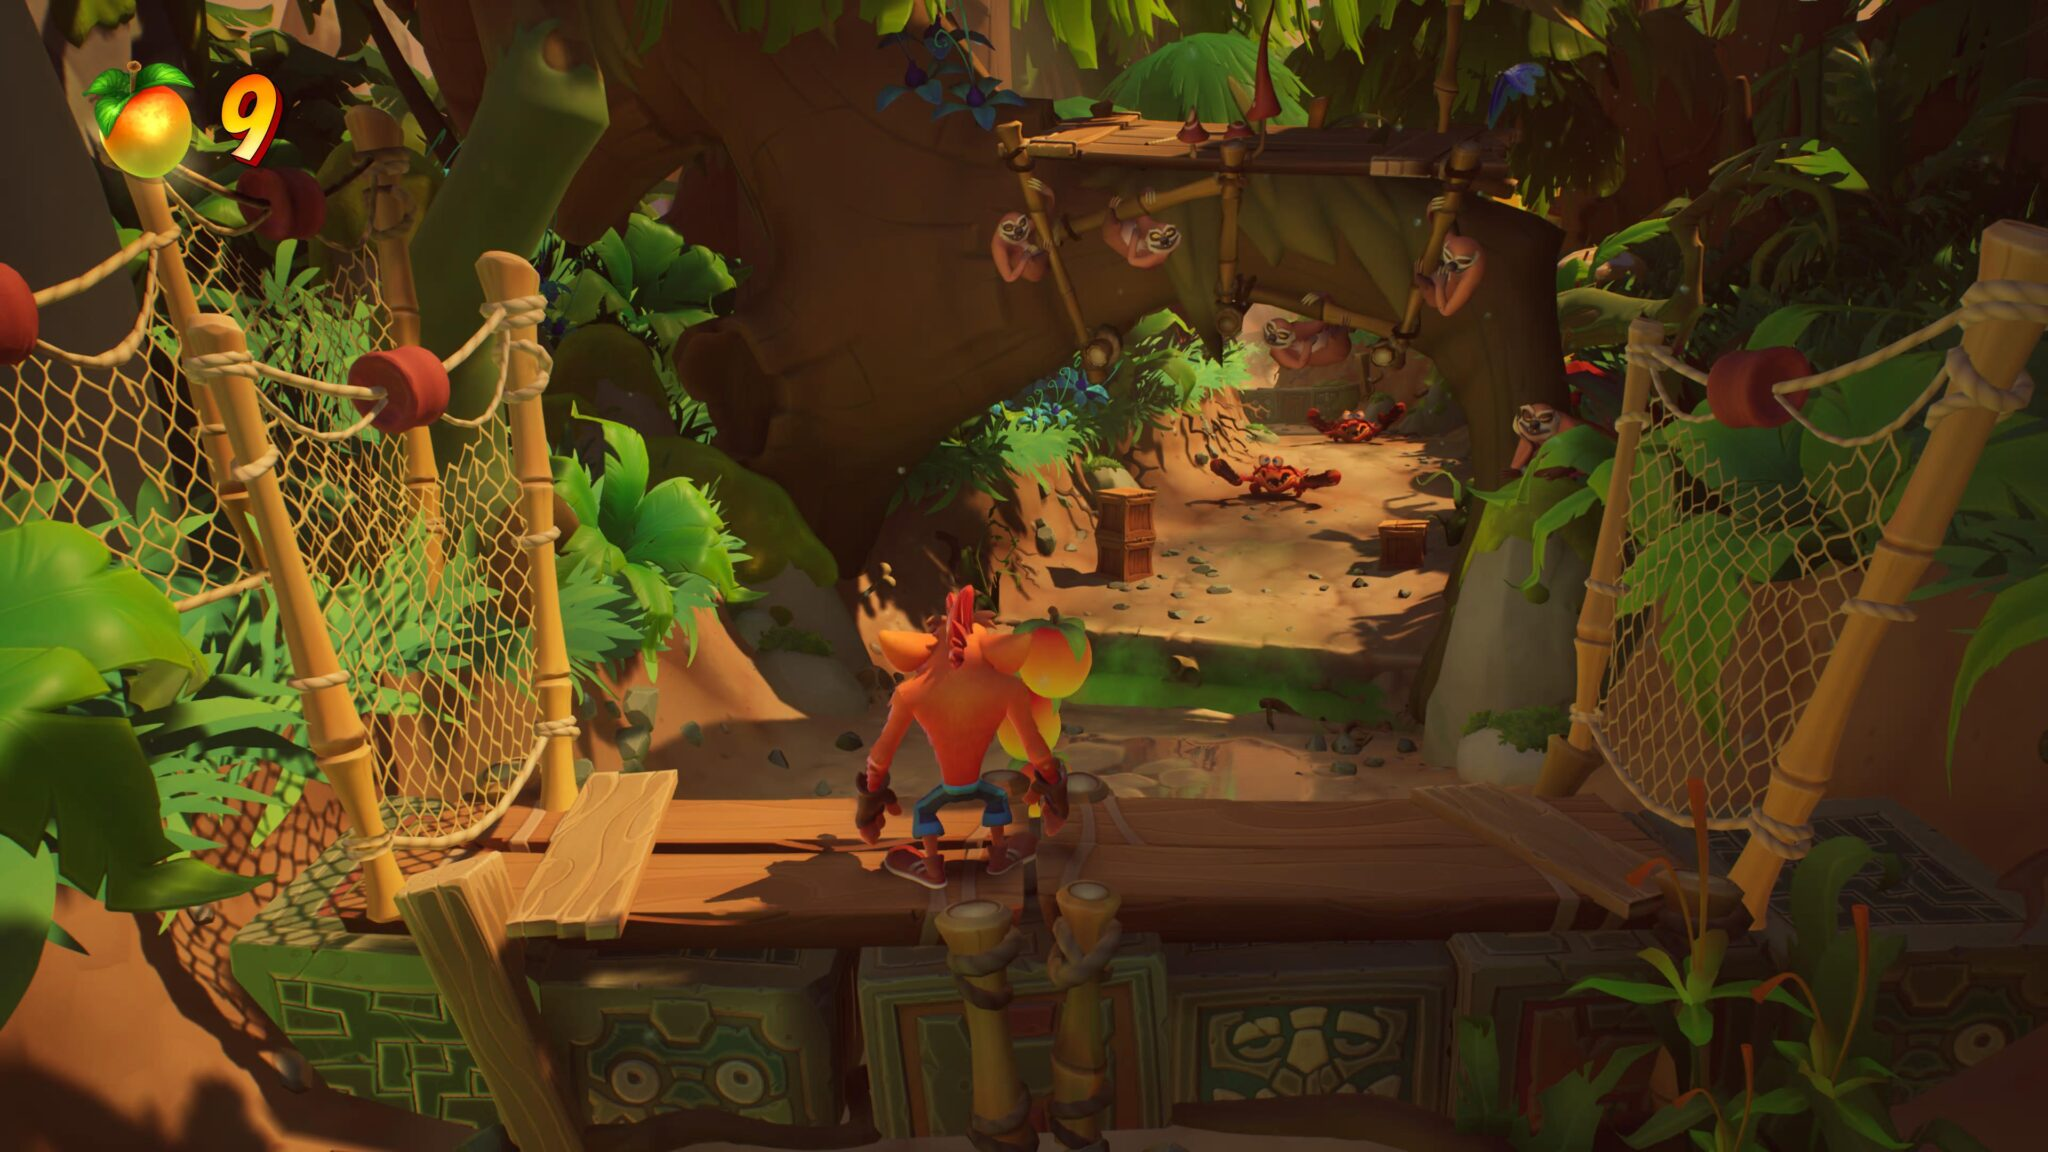 لعبة Crash Bandicoot 4 It's About Time PS5 (1)